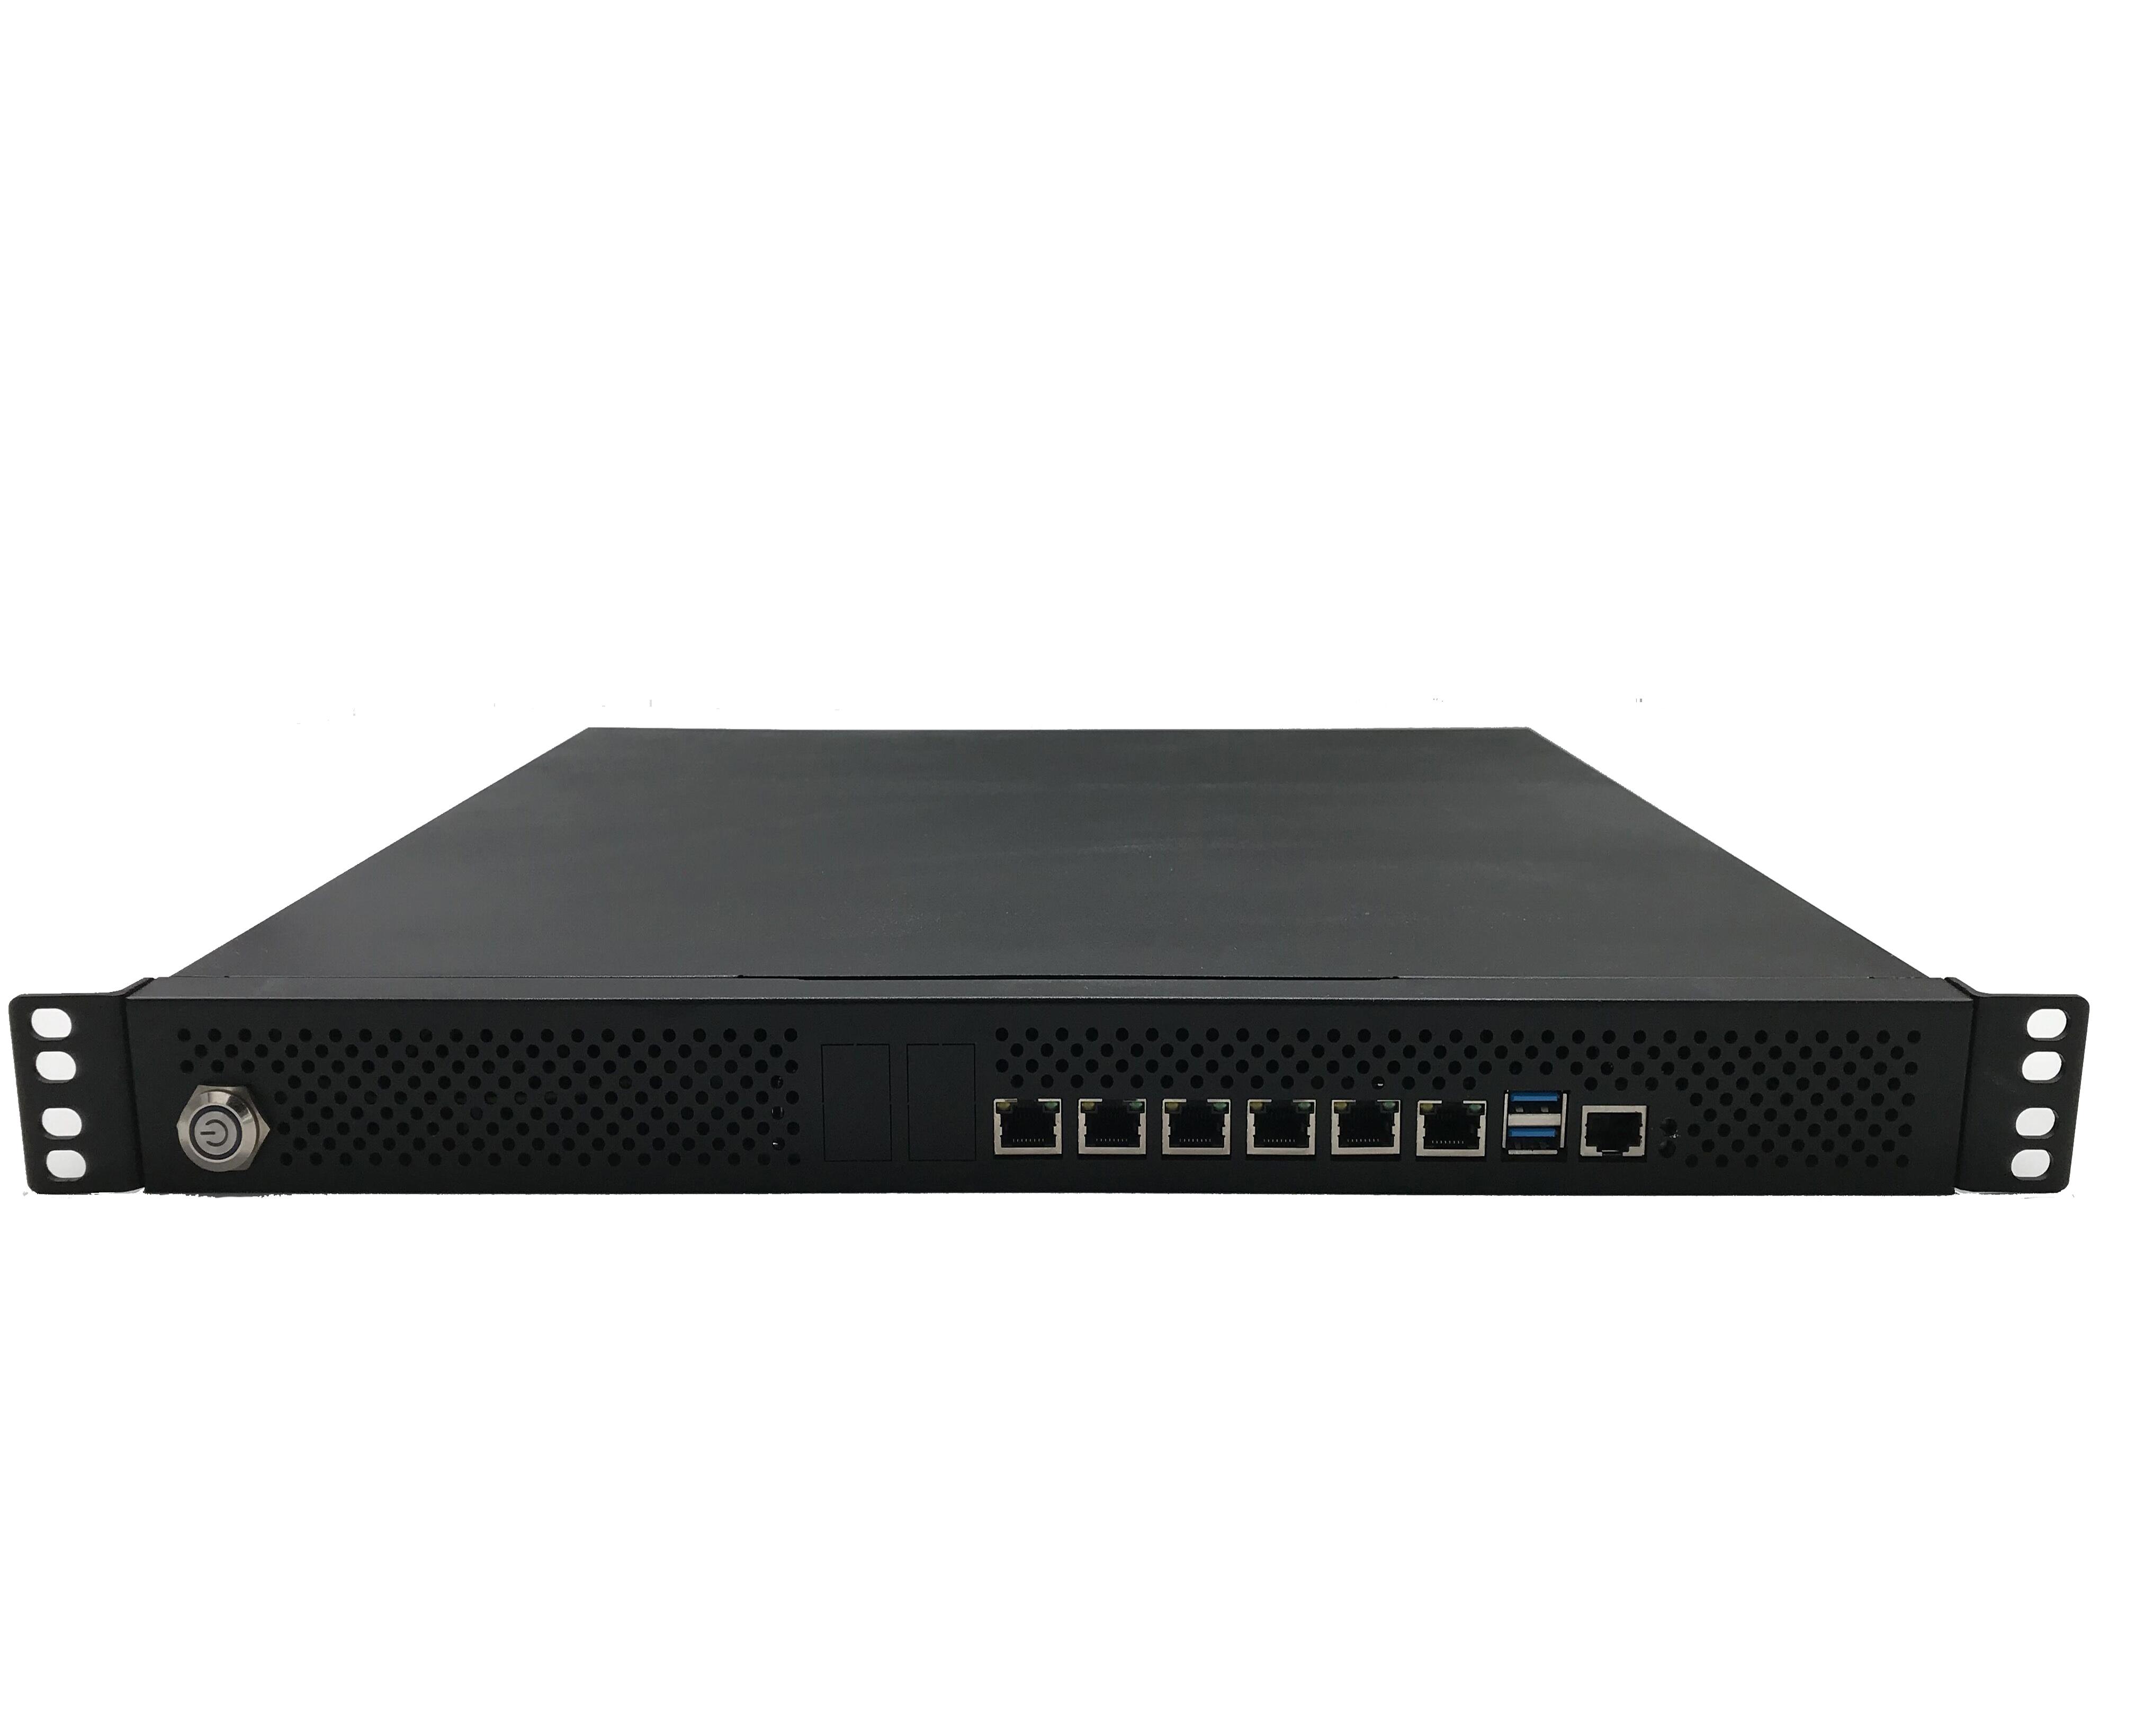 Intel Core i7/i5/i3, Xeon 1200 v5/v6 1U Rackmount Network